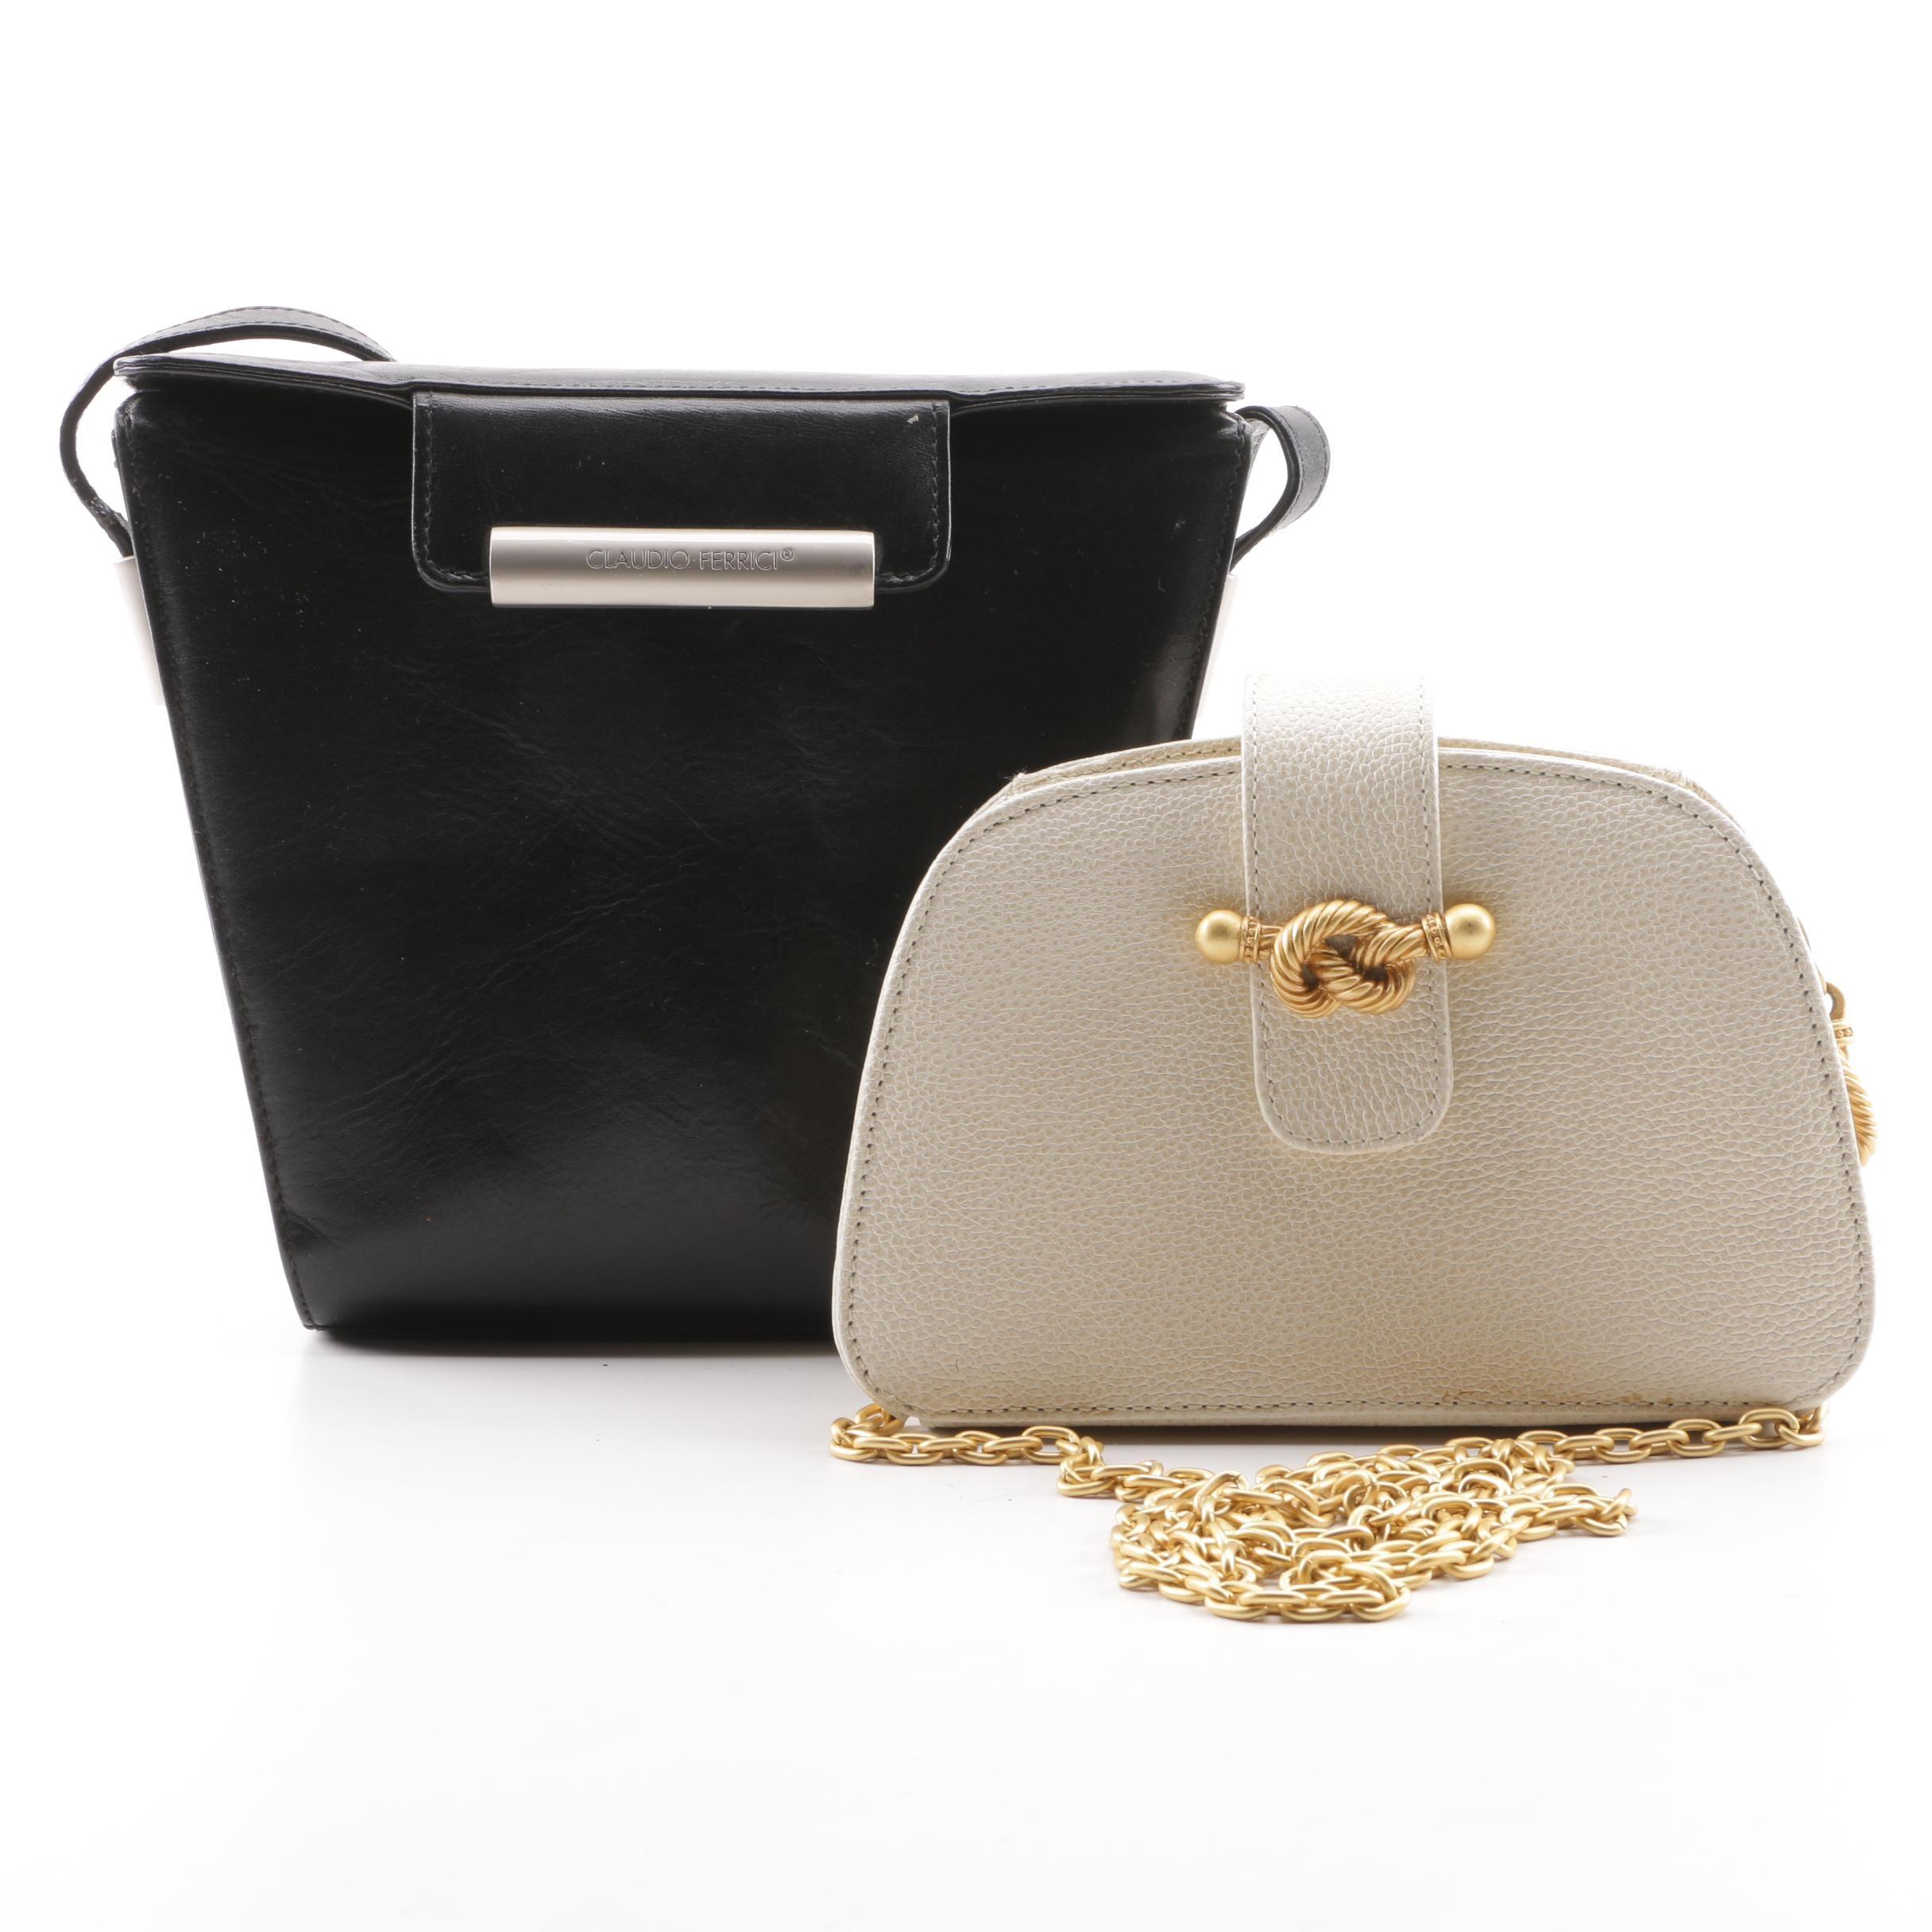 Claudio Ferrici and Vicenza Italian Leather Handbags